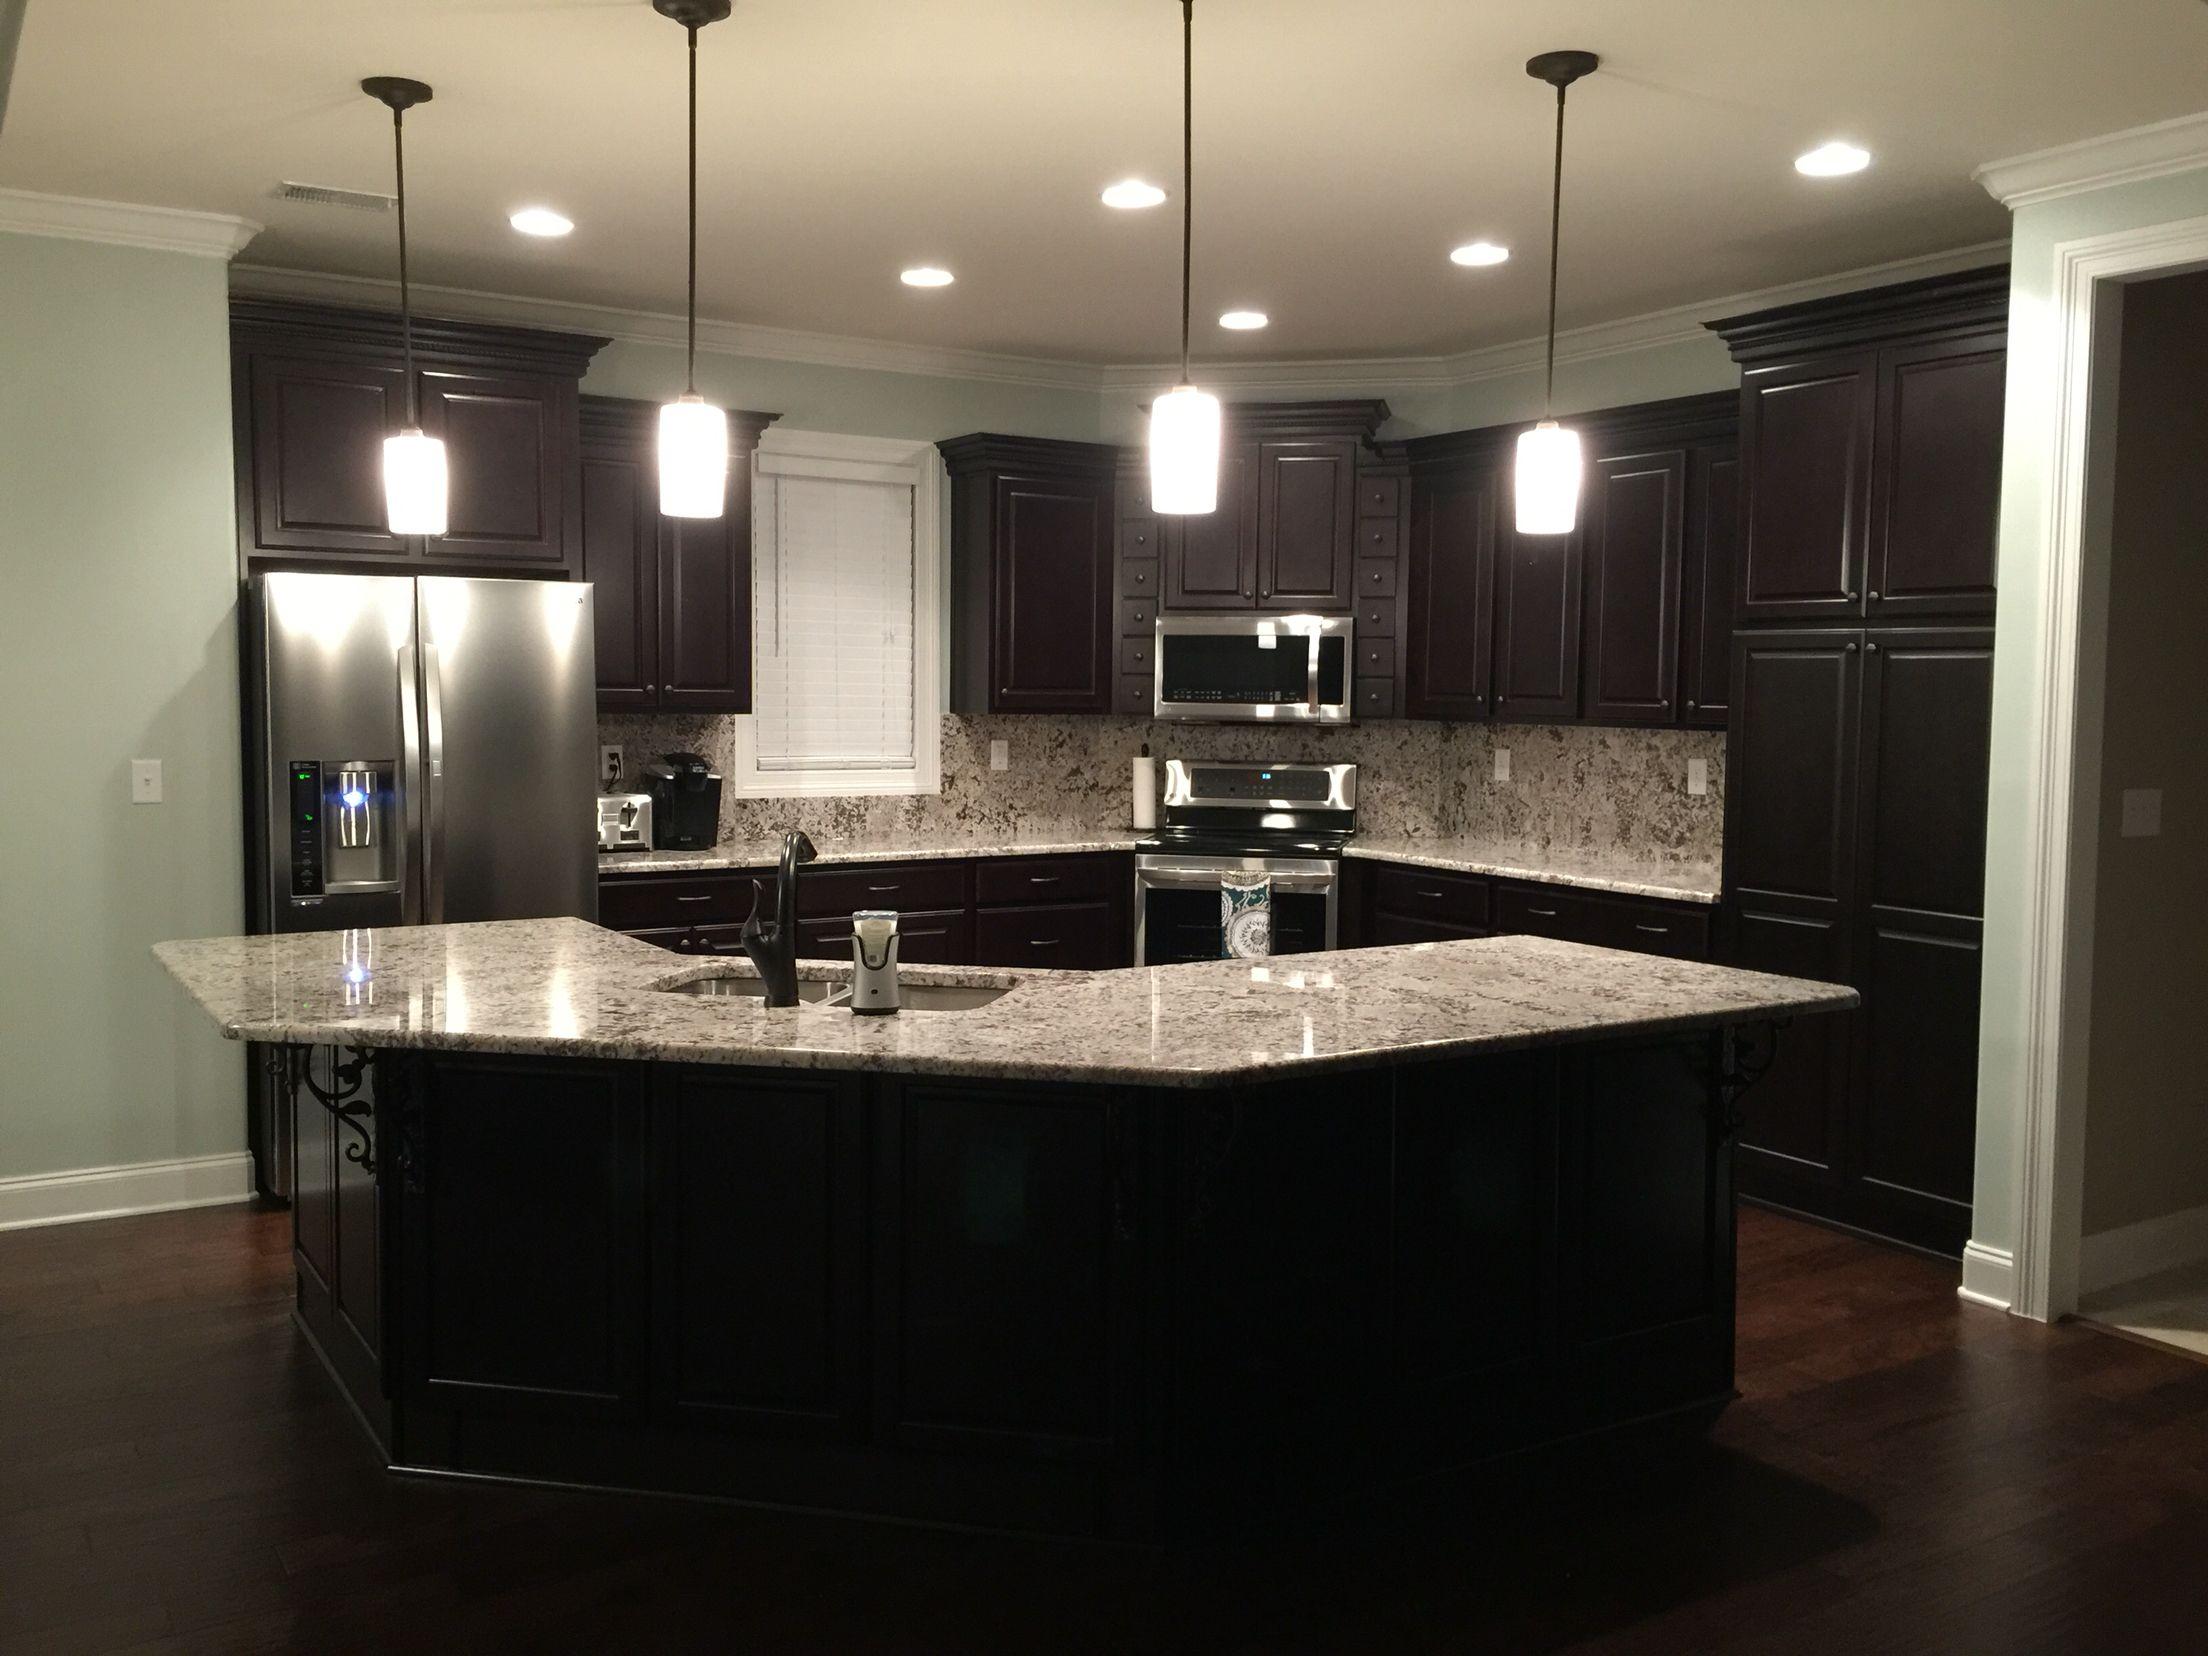 Kona Cabinets, Bonita Antico Granite Backsplash, Sherwin Williams Sea Salt  Paint, And Hardwood